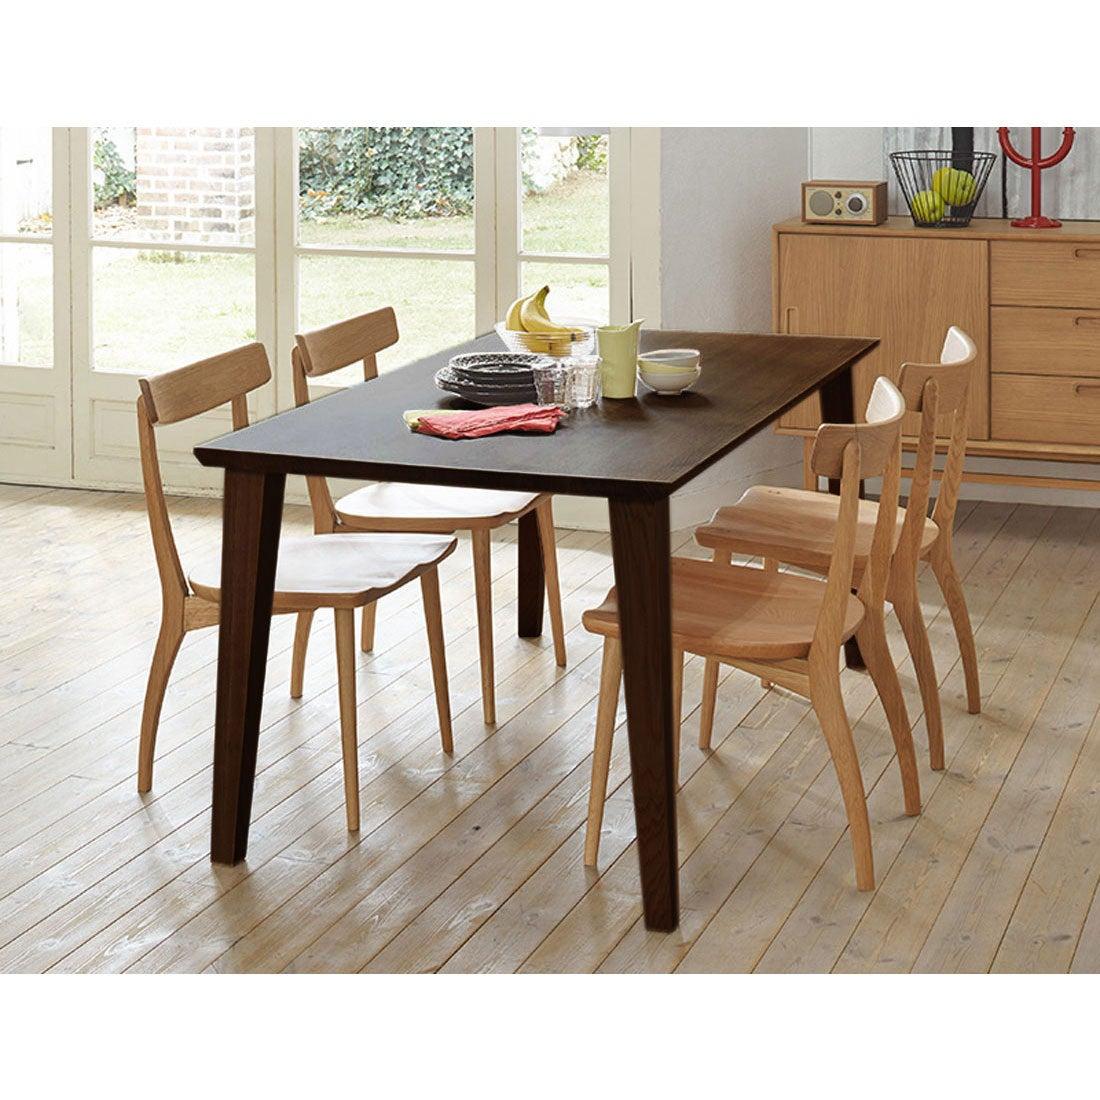 IDC OTSUKA/大塚家具 ダイニングテーブル フィル3 角天板/木製脚 W1600/オーク材DB色(ダークブラウン)